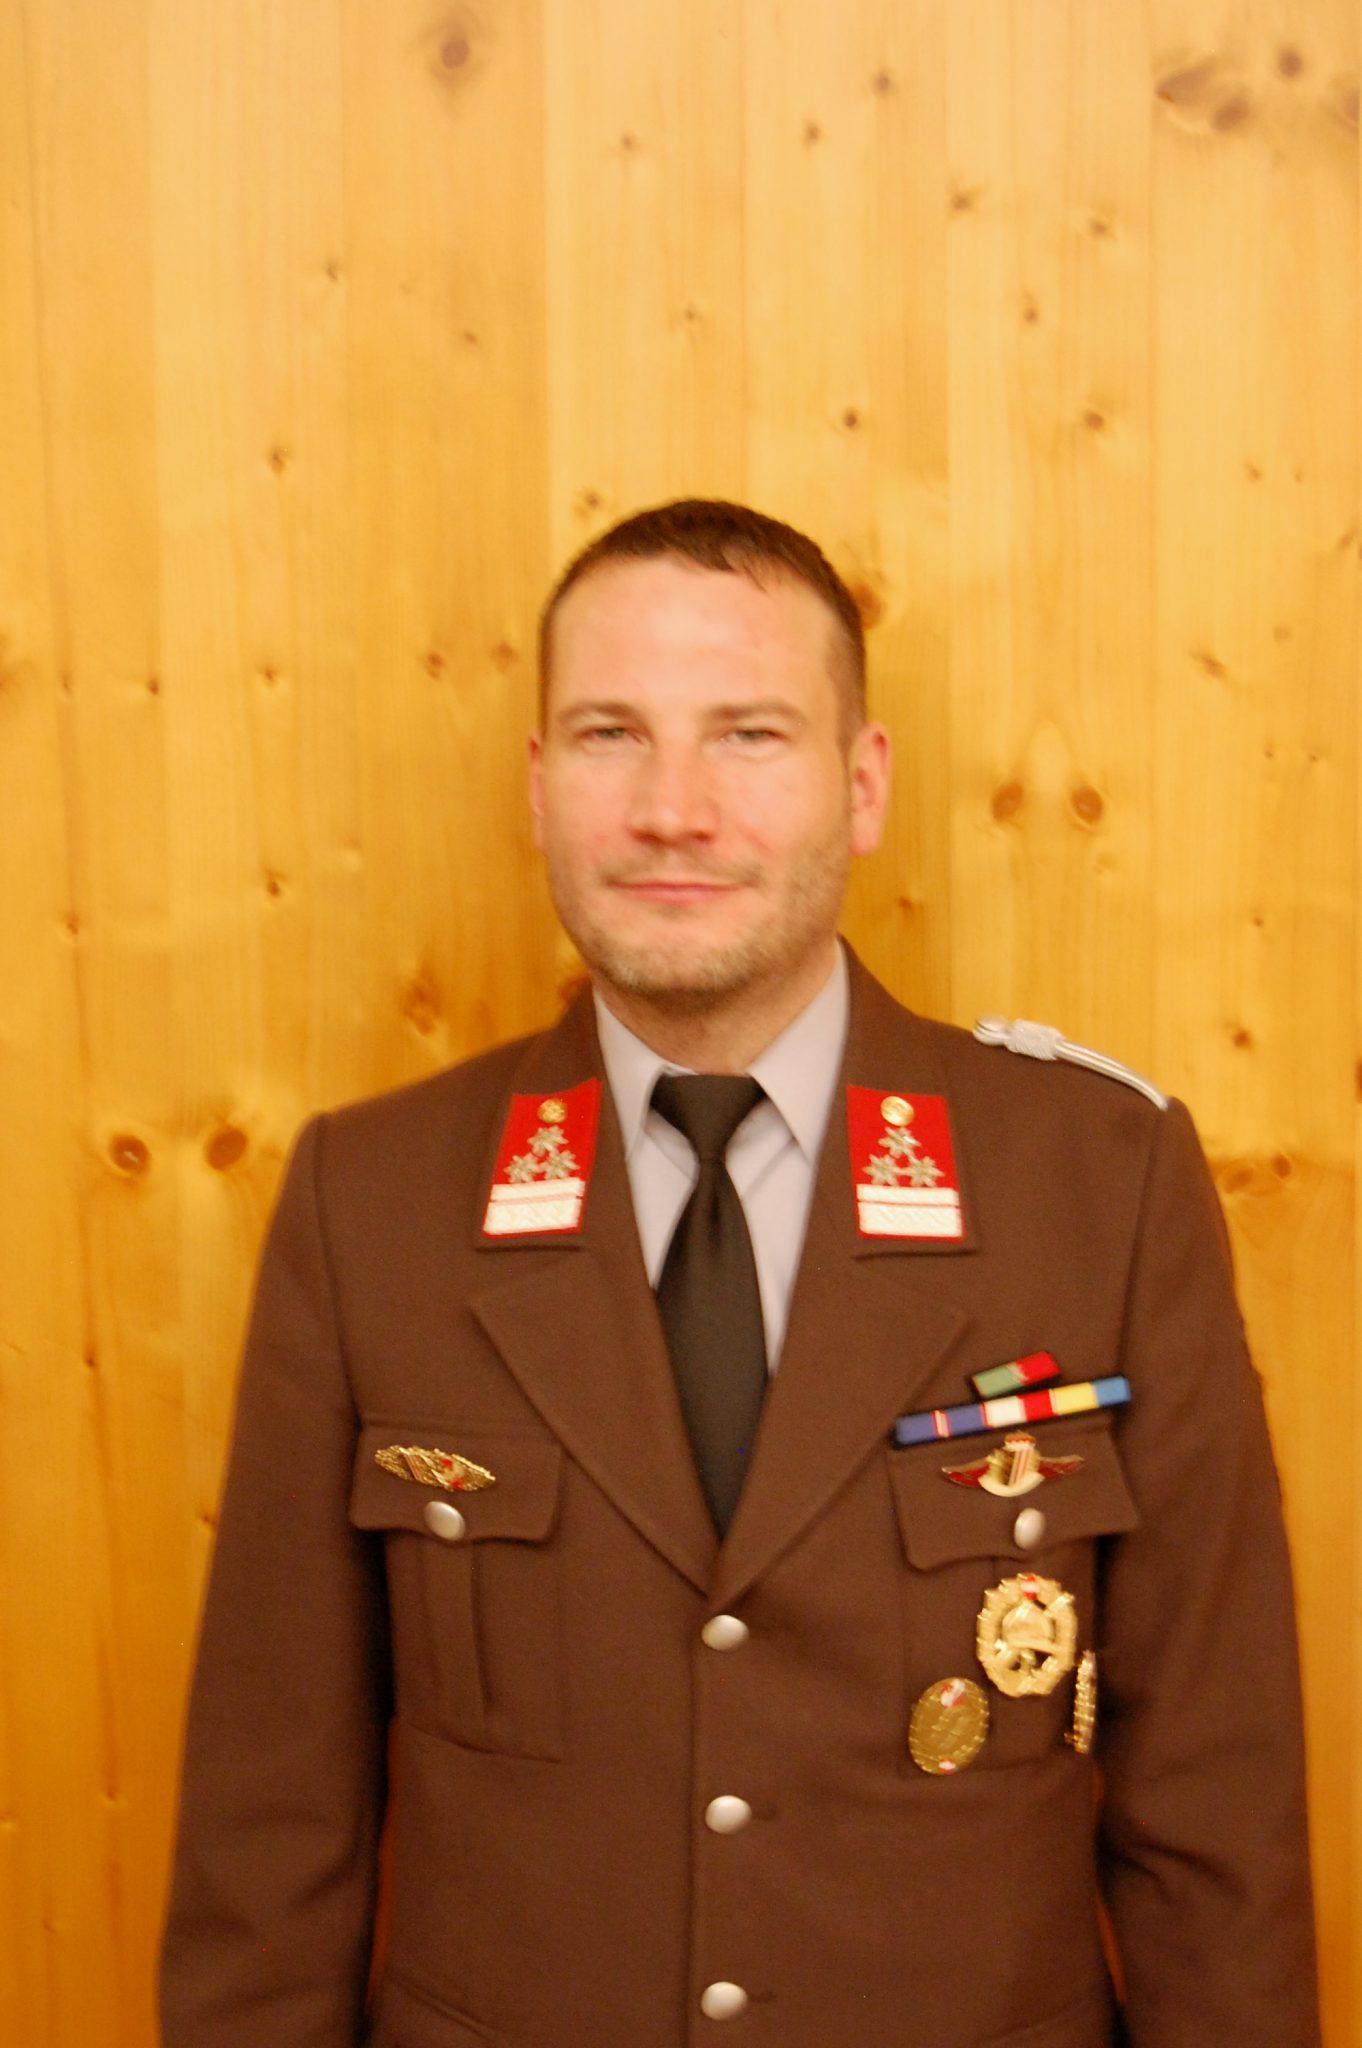 Profilbild von BI Rene Bauhofer